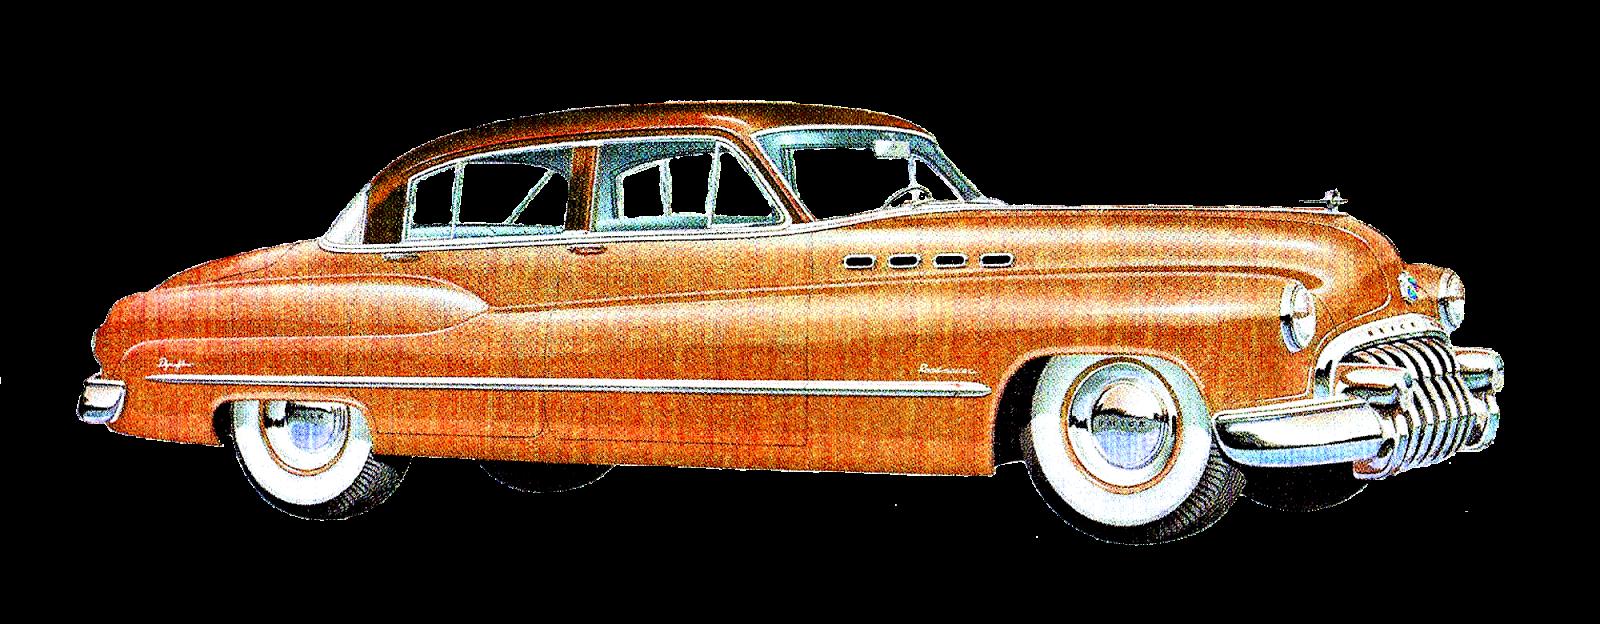 1600x624 1950 Vintage Buick Download Graphics Fairy Amp Antique Images